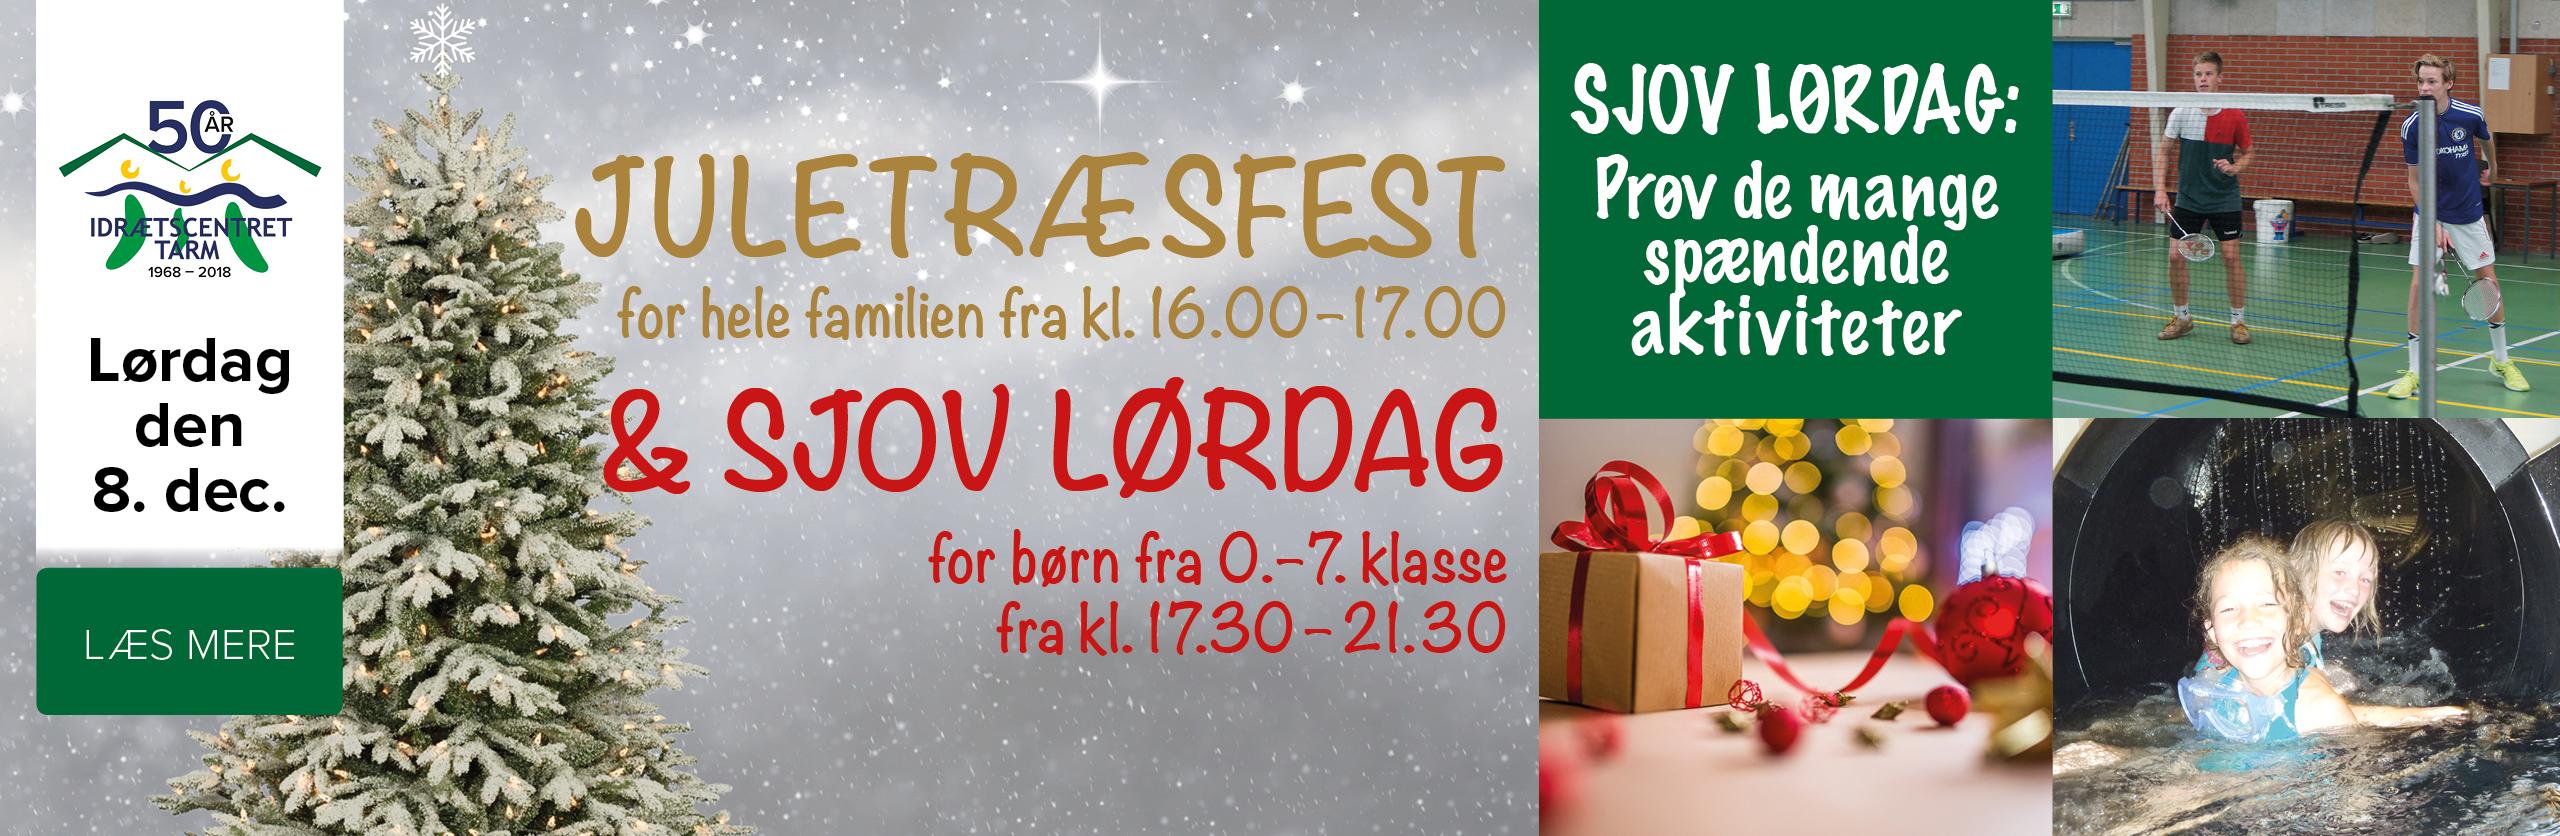 Juletræsfest & SJOV LØRDAG d. 8. december 2018